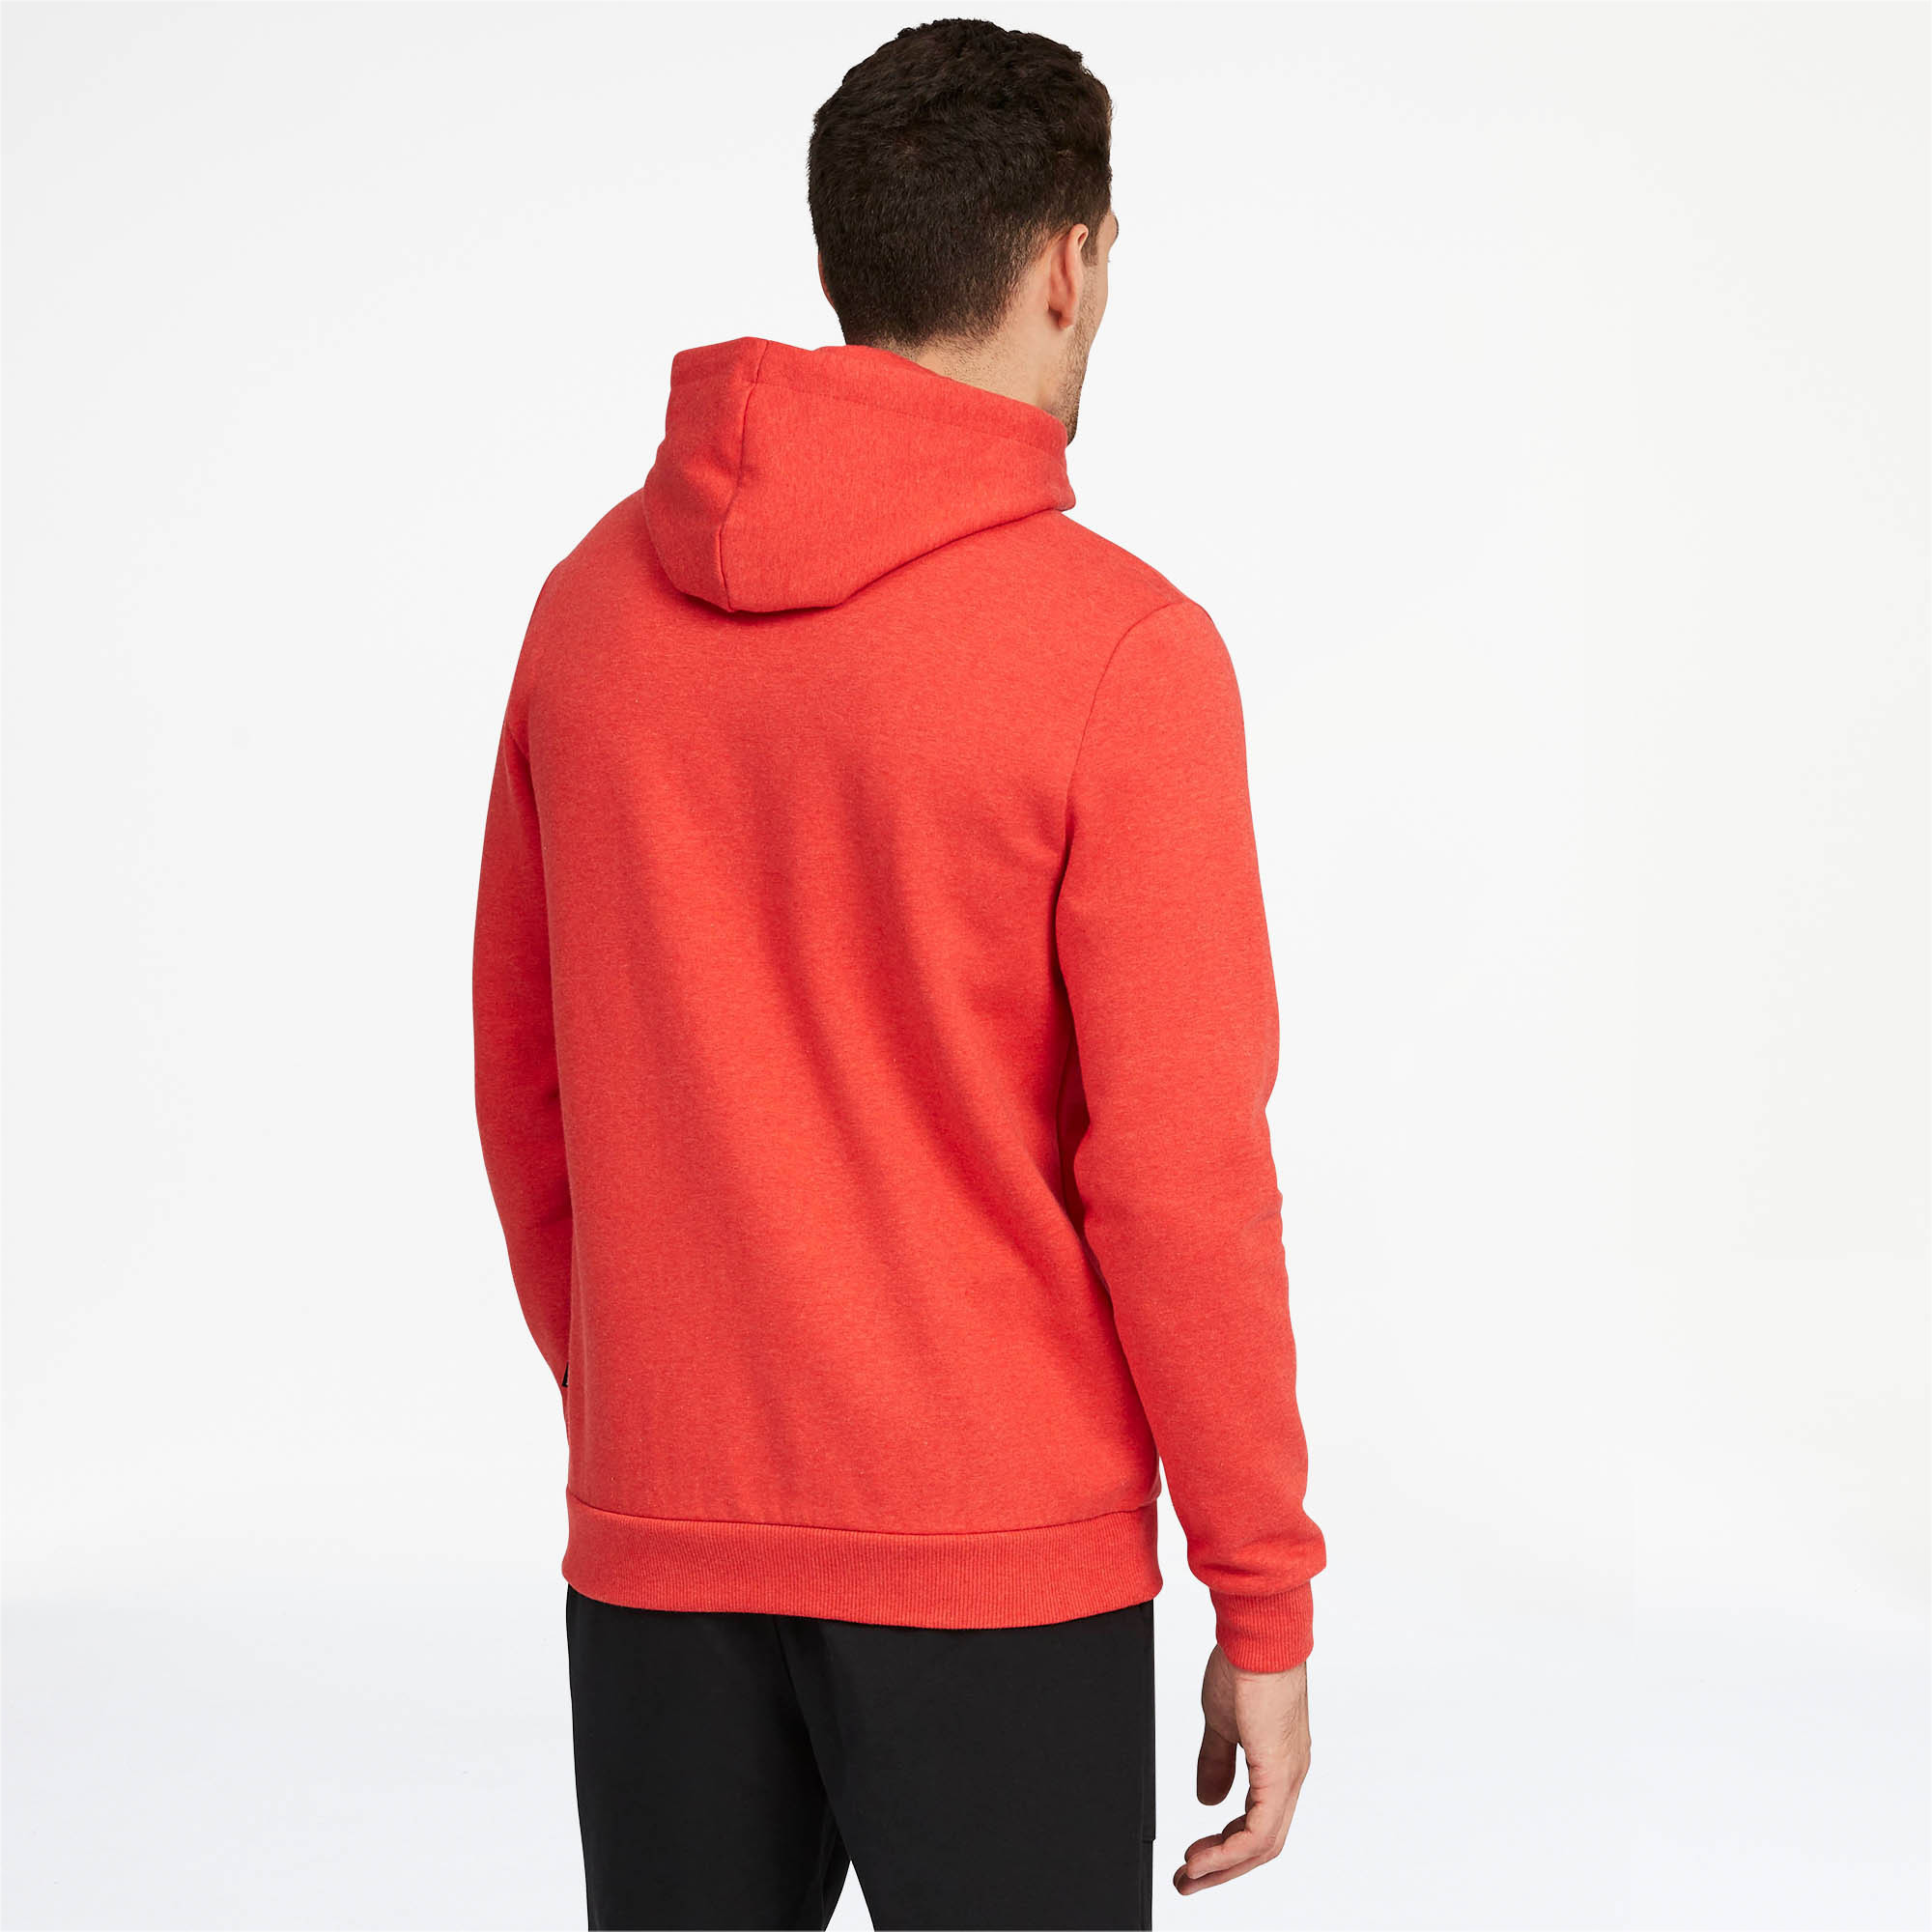 PUMA-Essentials-Men-039-s-Fleece-Hooded-Jacket-Men-Sweat-Basics thumbnail 12